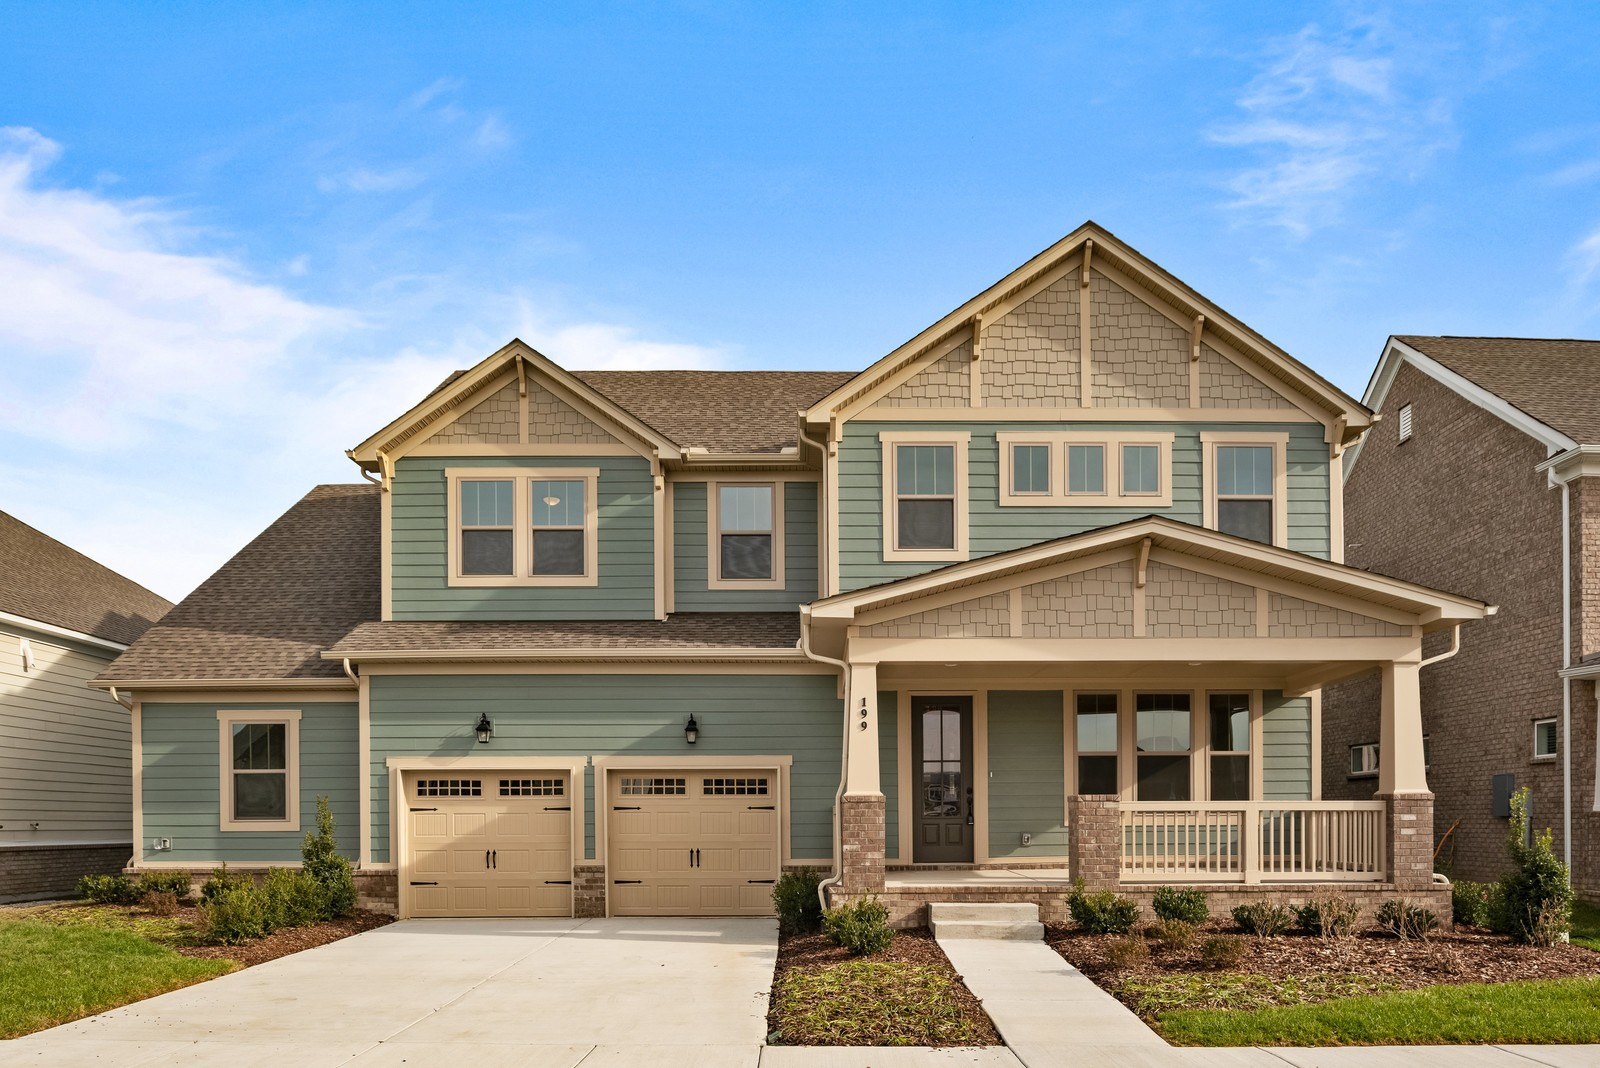 199 Ashington Circle #95, Hendersonville, TN 37075 - Hendersonville, TN real estate listing